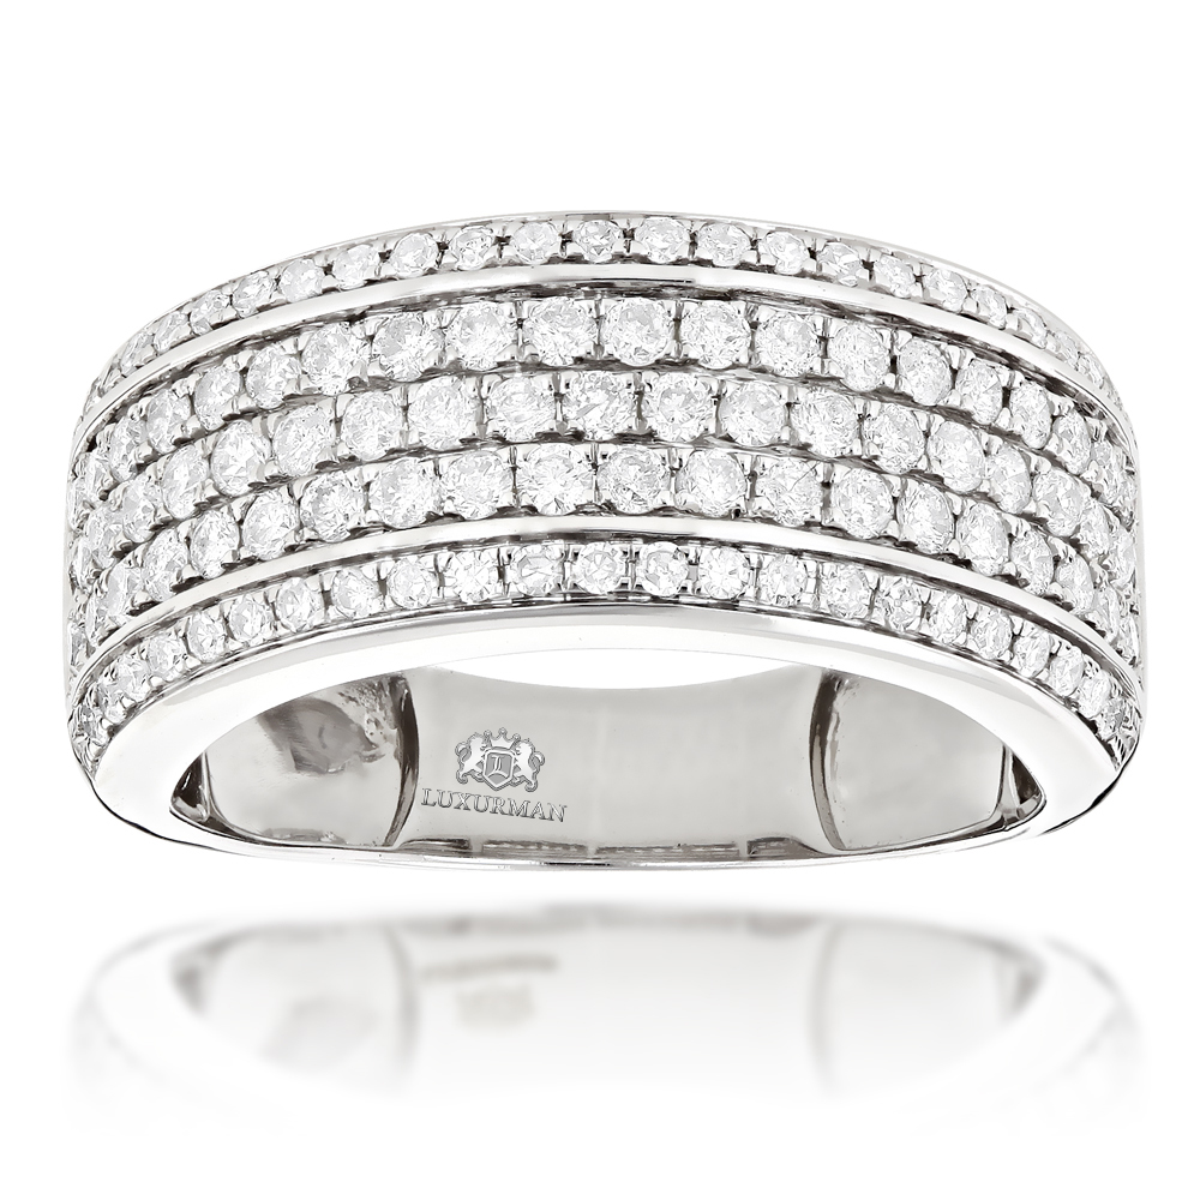 Mens Diamond Wedding Band Designer Ring by Luxurman 1.5ct